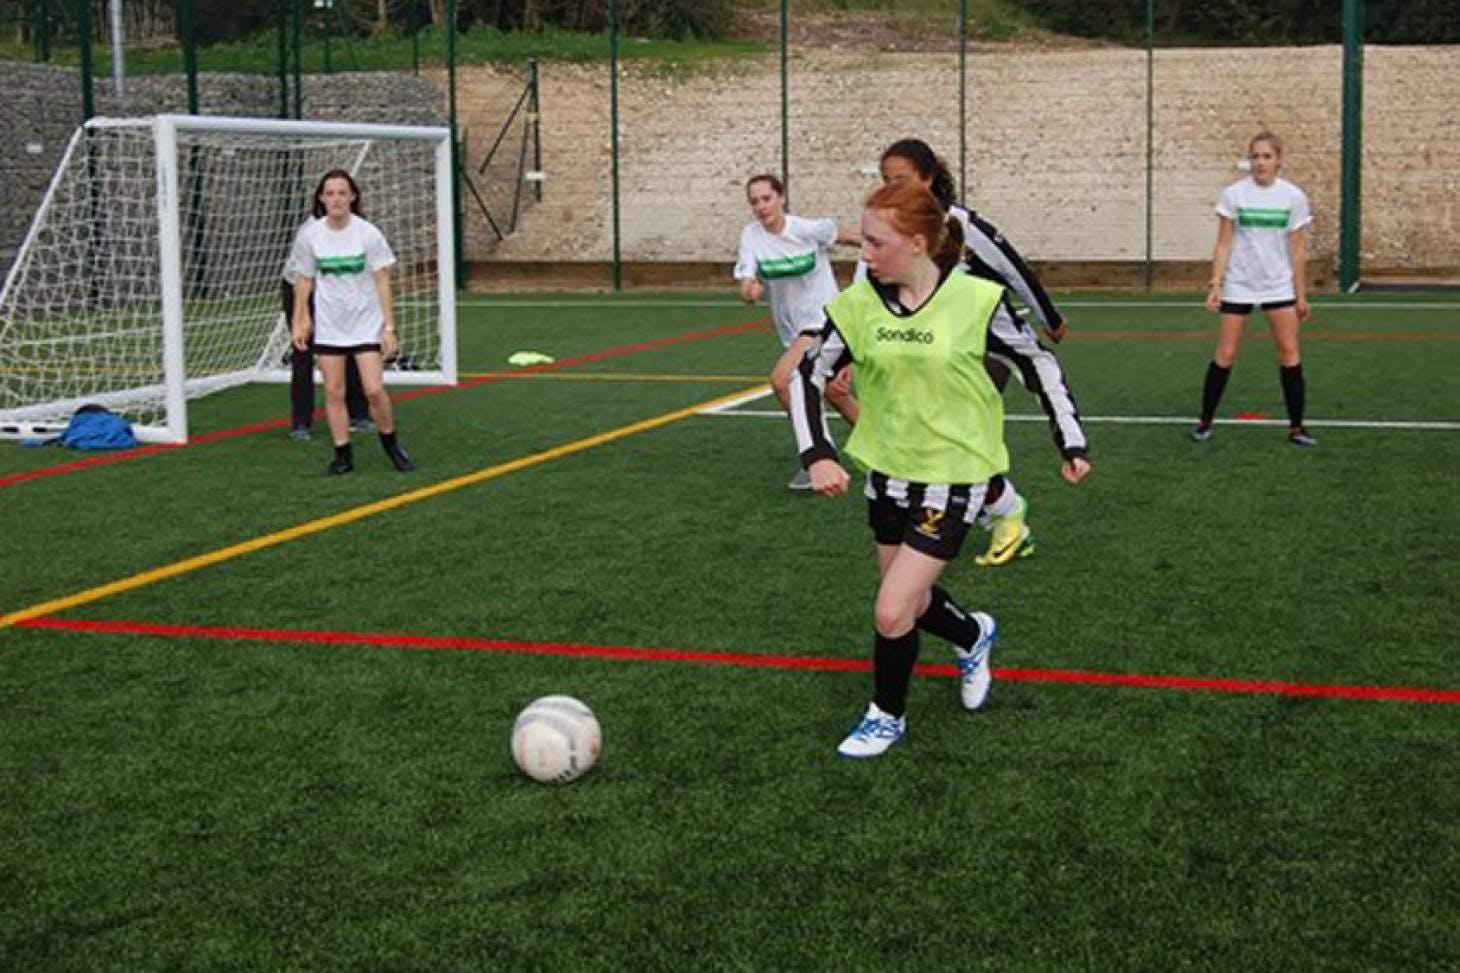 Dorothy Stringer School 7 a side | 3G Astroturf football pitch